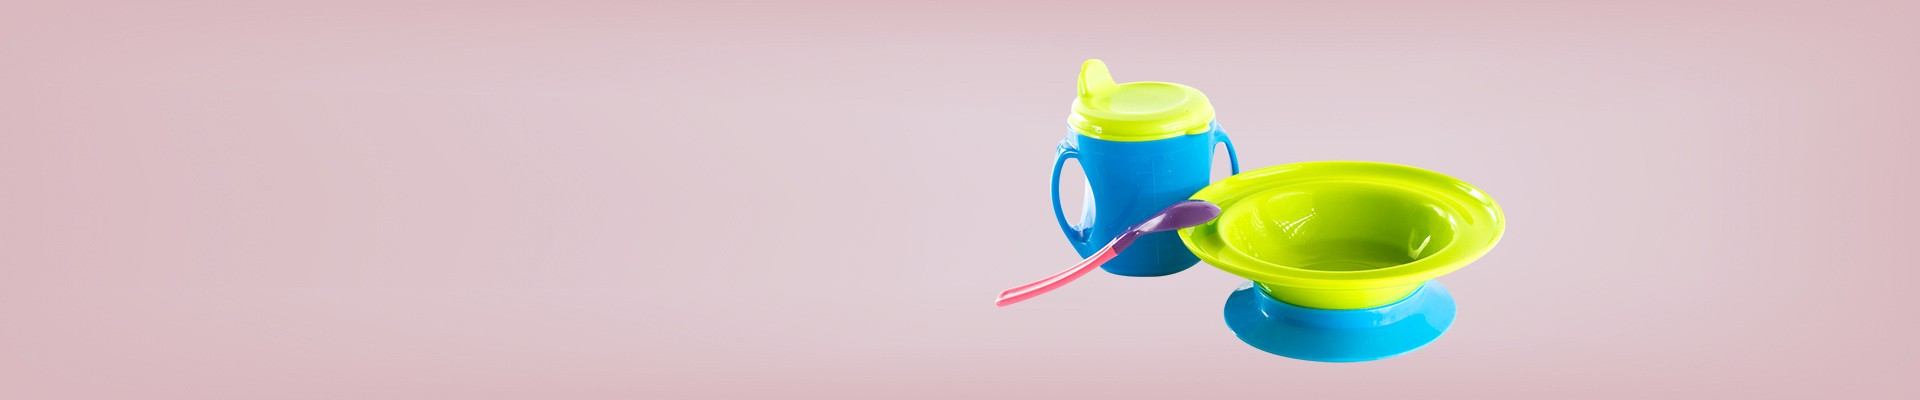 Jual Set Alat Makan Bayi Paling Hemat